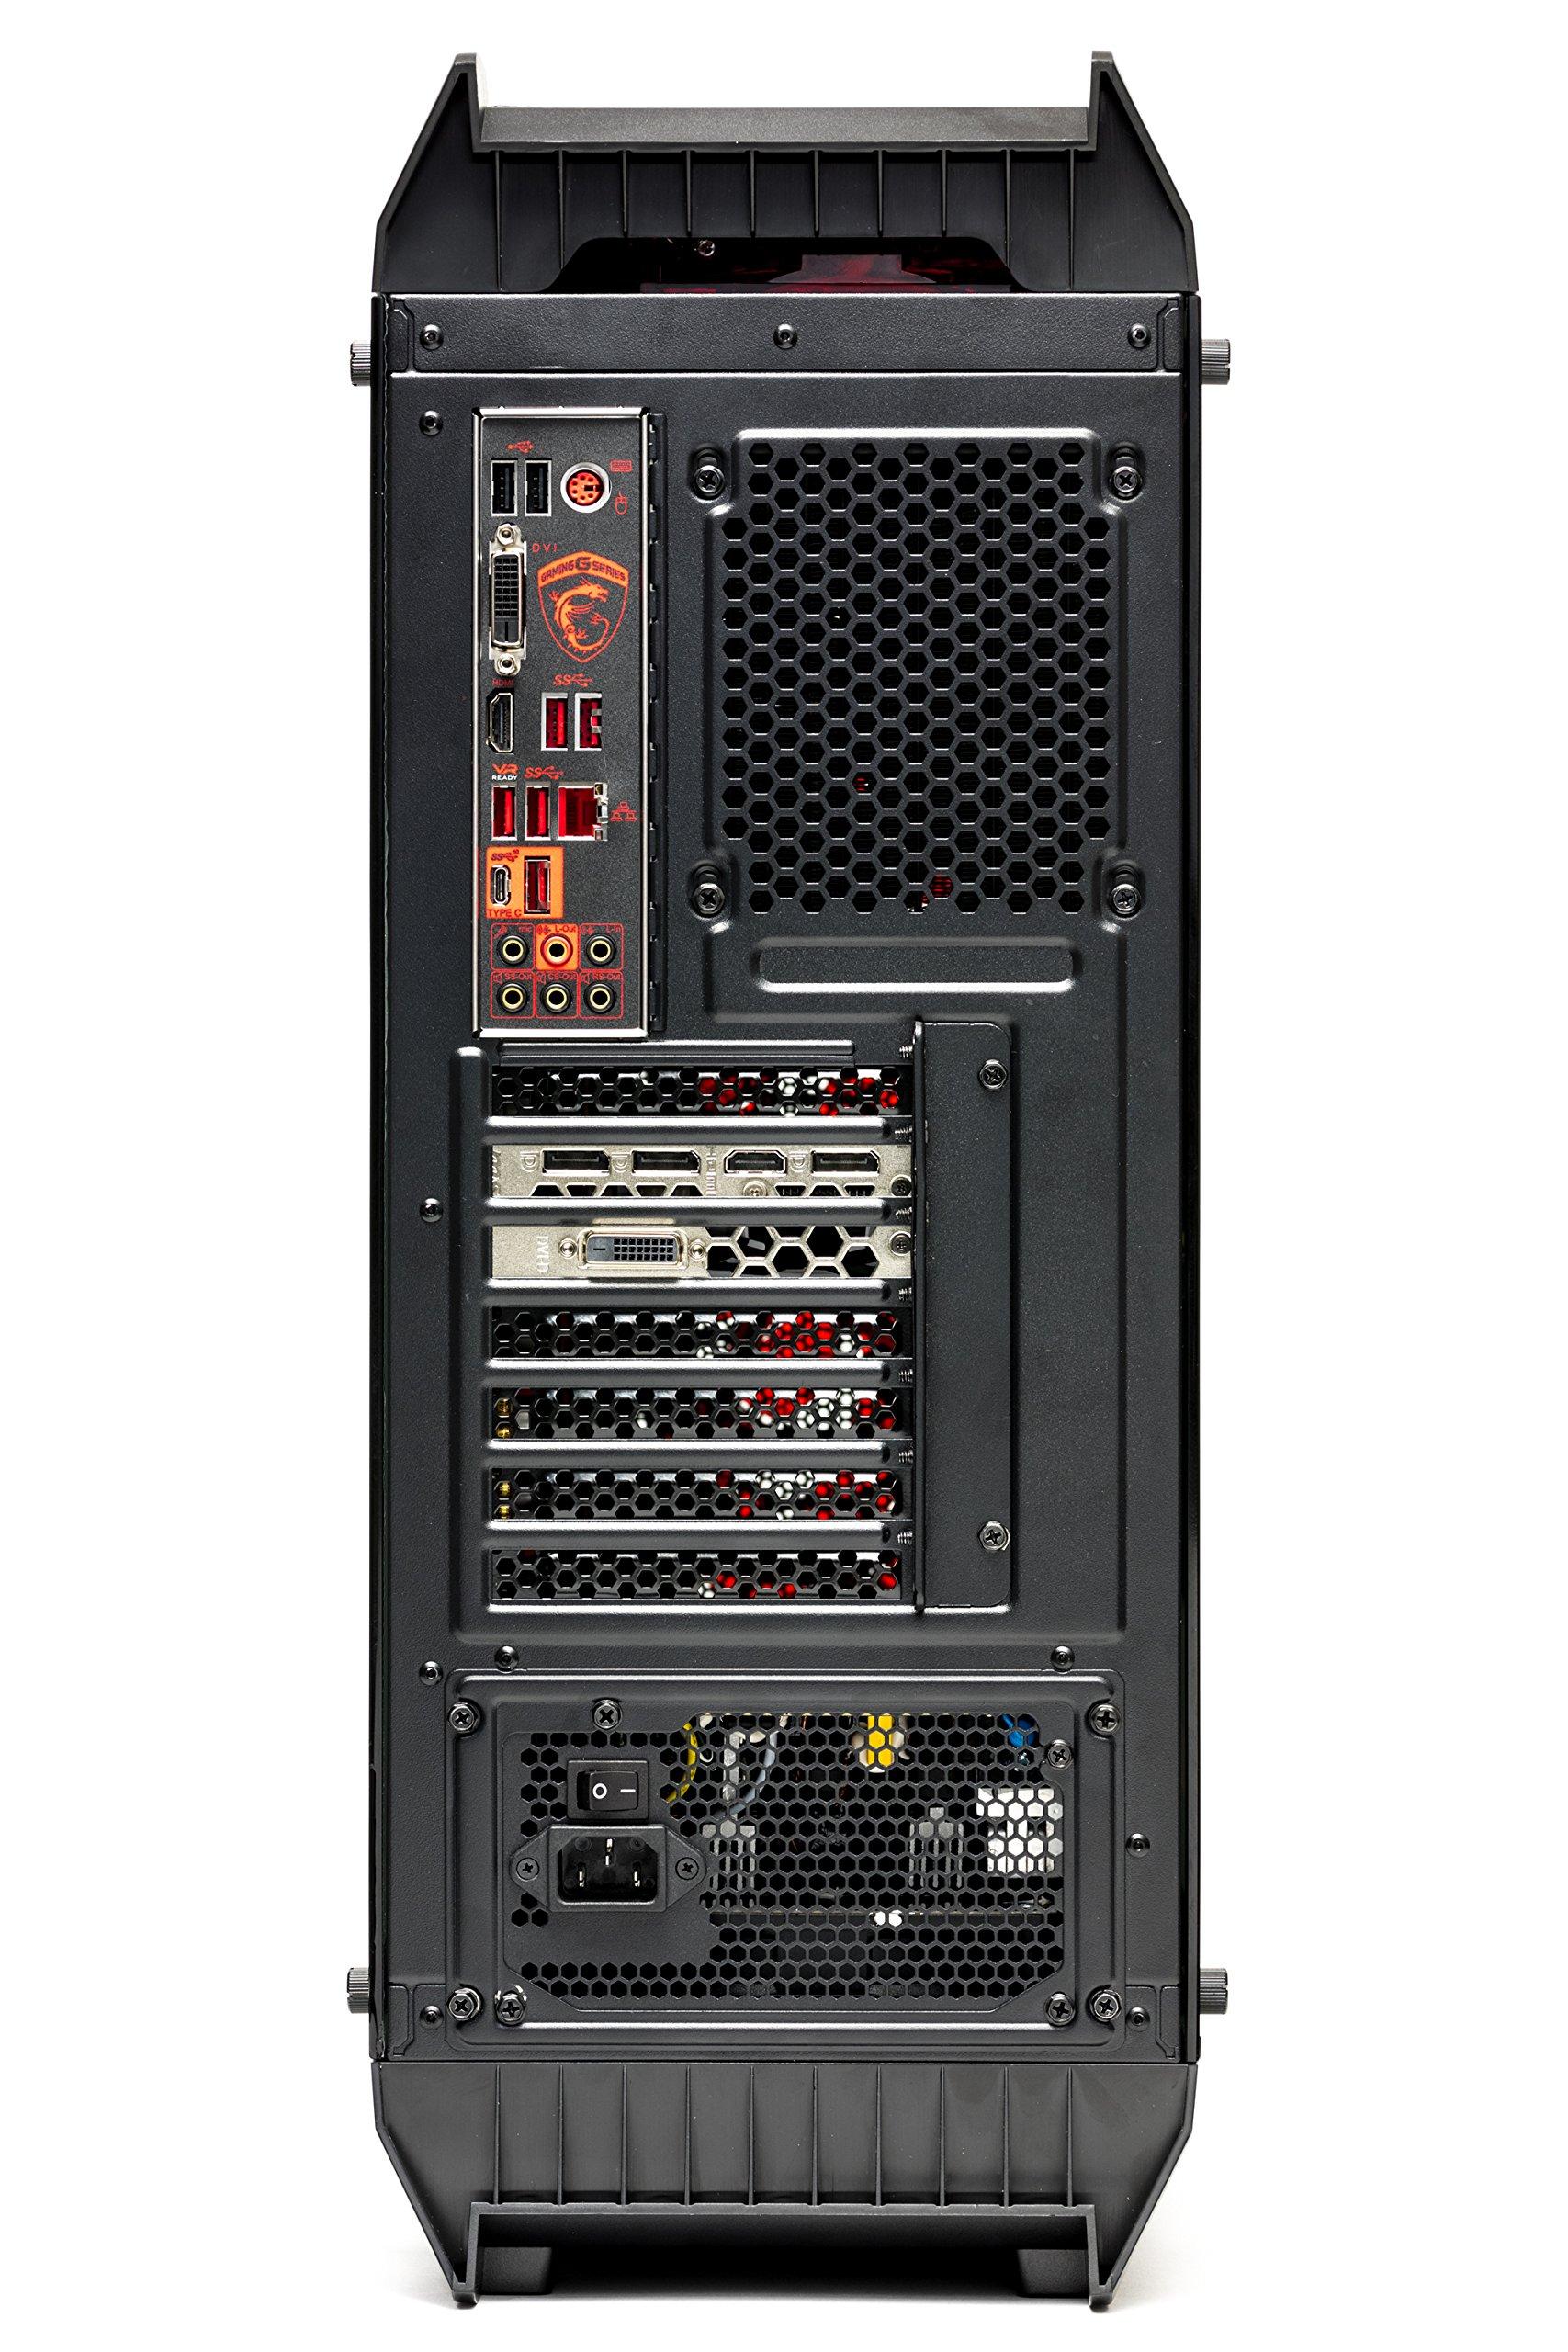 SkyTech Siege - Gaming Computer PC Desktop - RYZEN 7 1700X, Samsung 850 EVO 250GB SSD, GTX 1080 8GB, 120mm Liquid Cool, 2TB HDD, 16GB DDR4, Windows 10 Home (Ryzen 7 1700X | GTX 1080) by Skytech Gaming (Image #7)